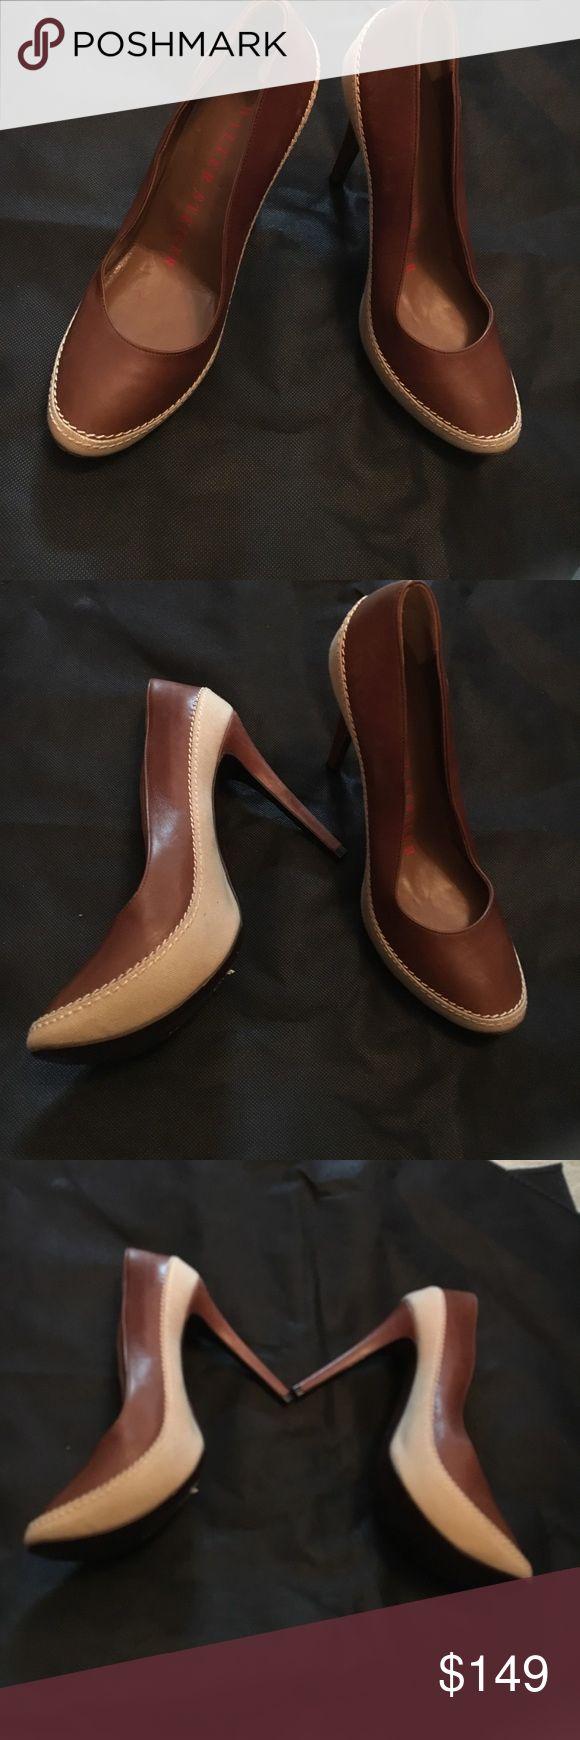 Walter Steiger heel Walter Steiger two tone linen leather heels Walter Steiger Shoes Heels